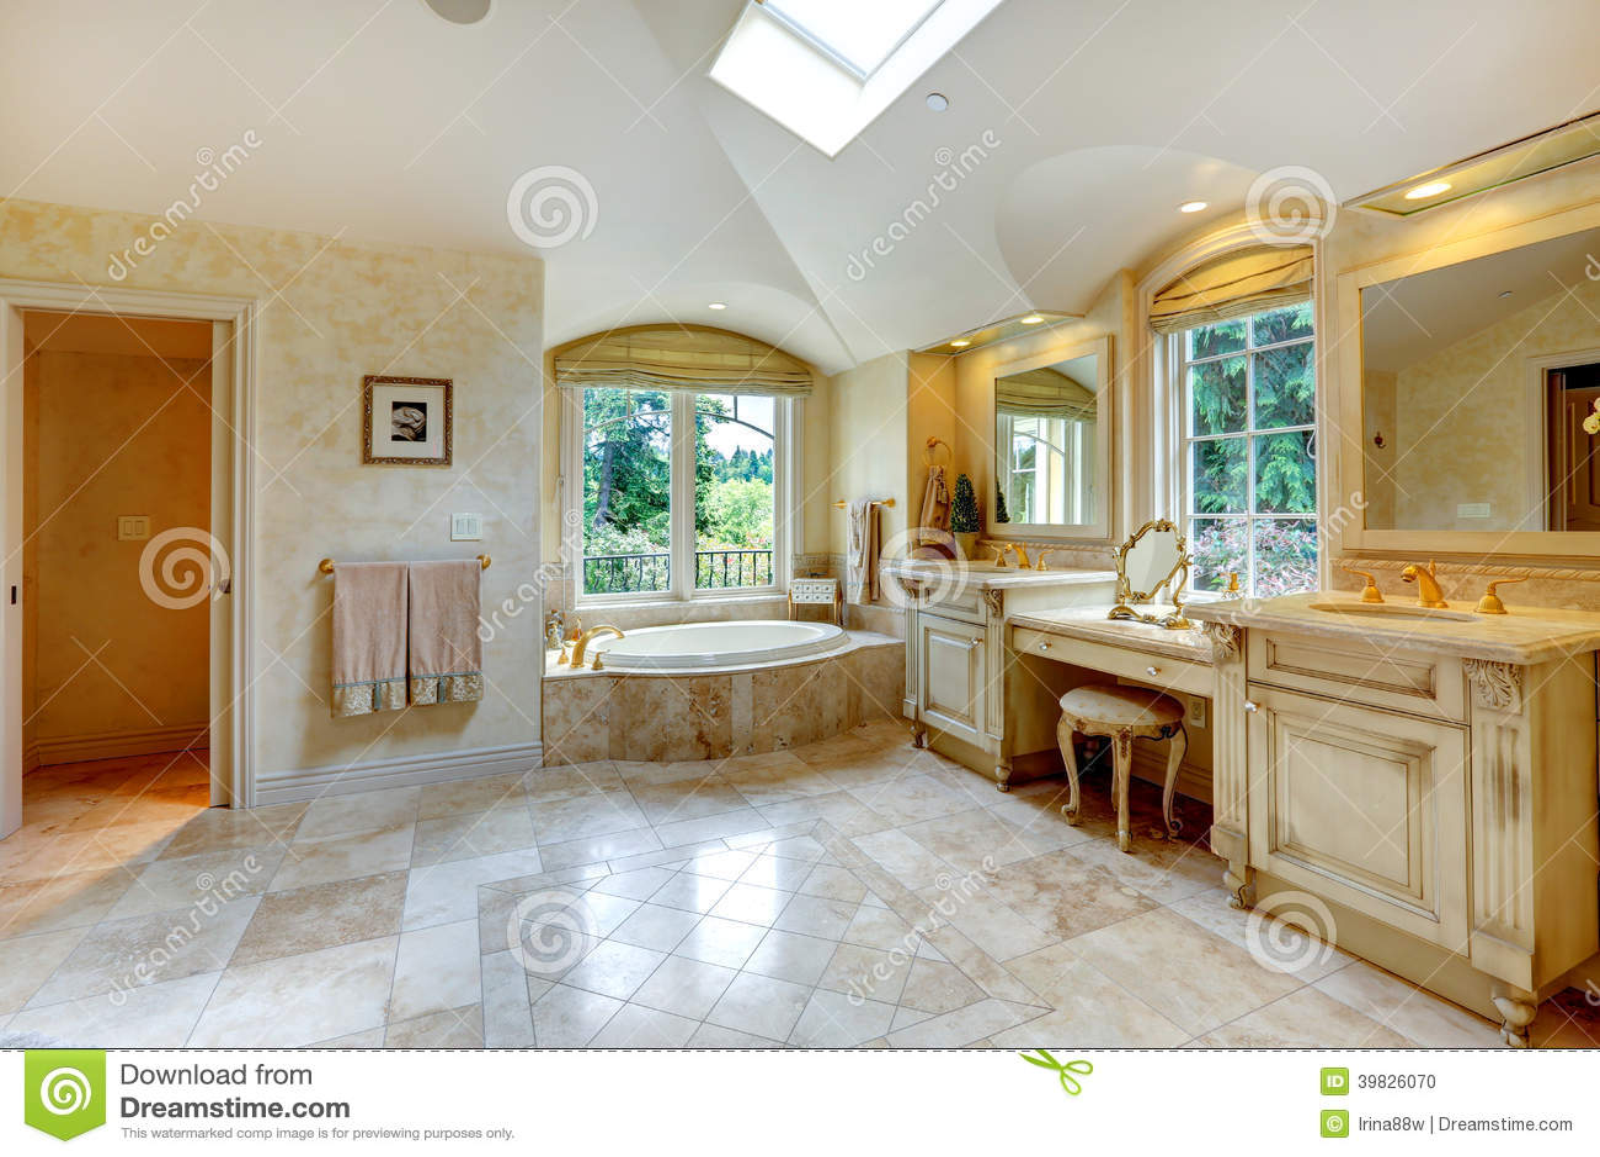 Luxury bathroom with antique vanity and cabinets stock for Luxury bathroom vanity cabinets